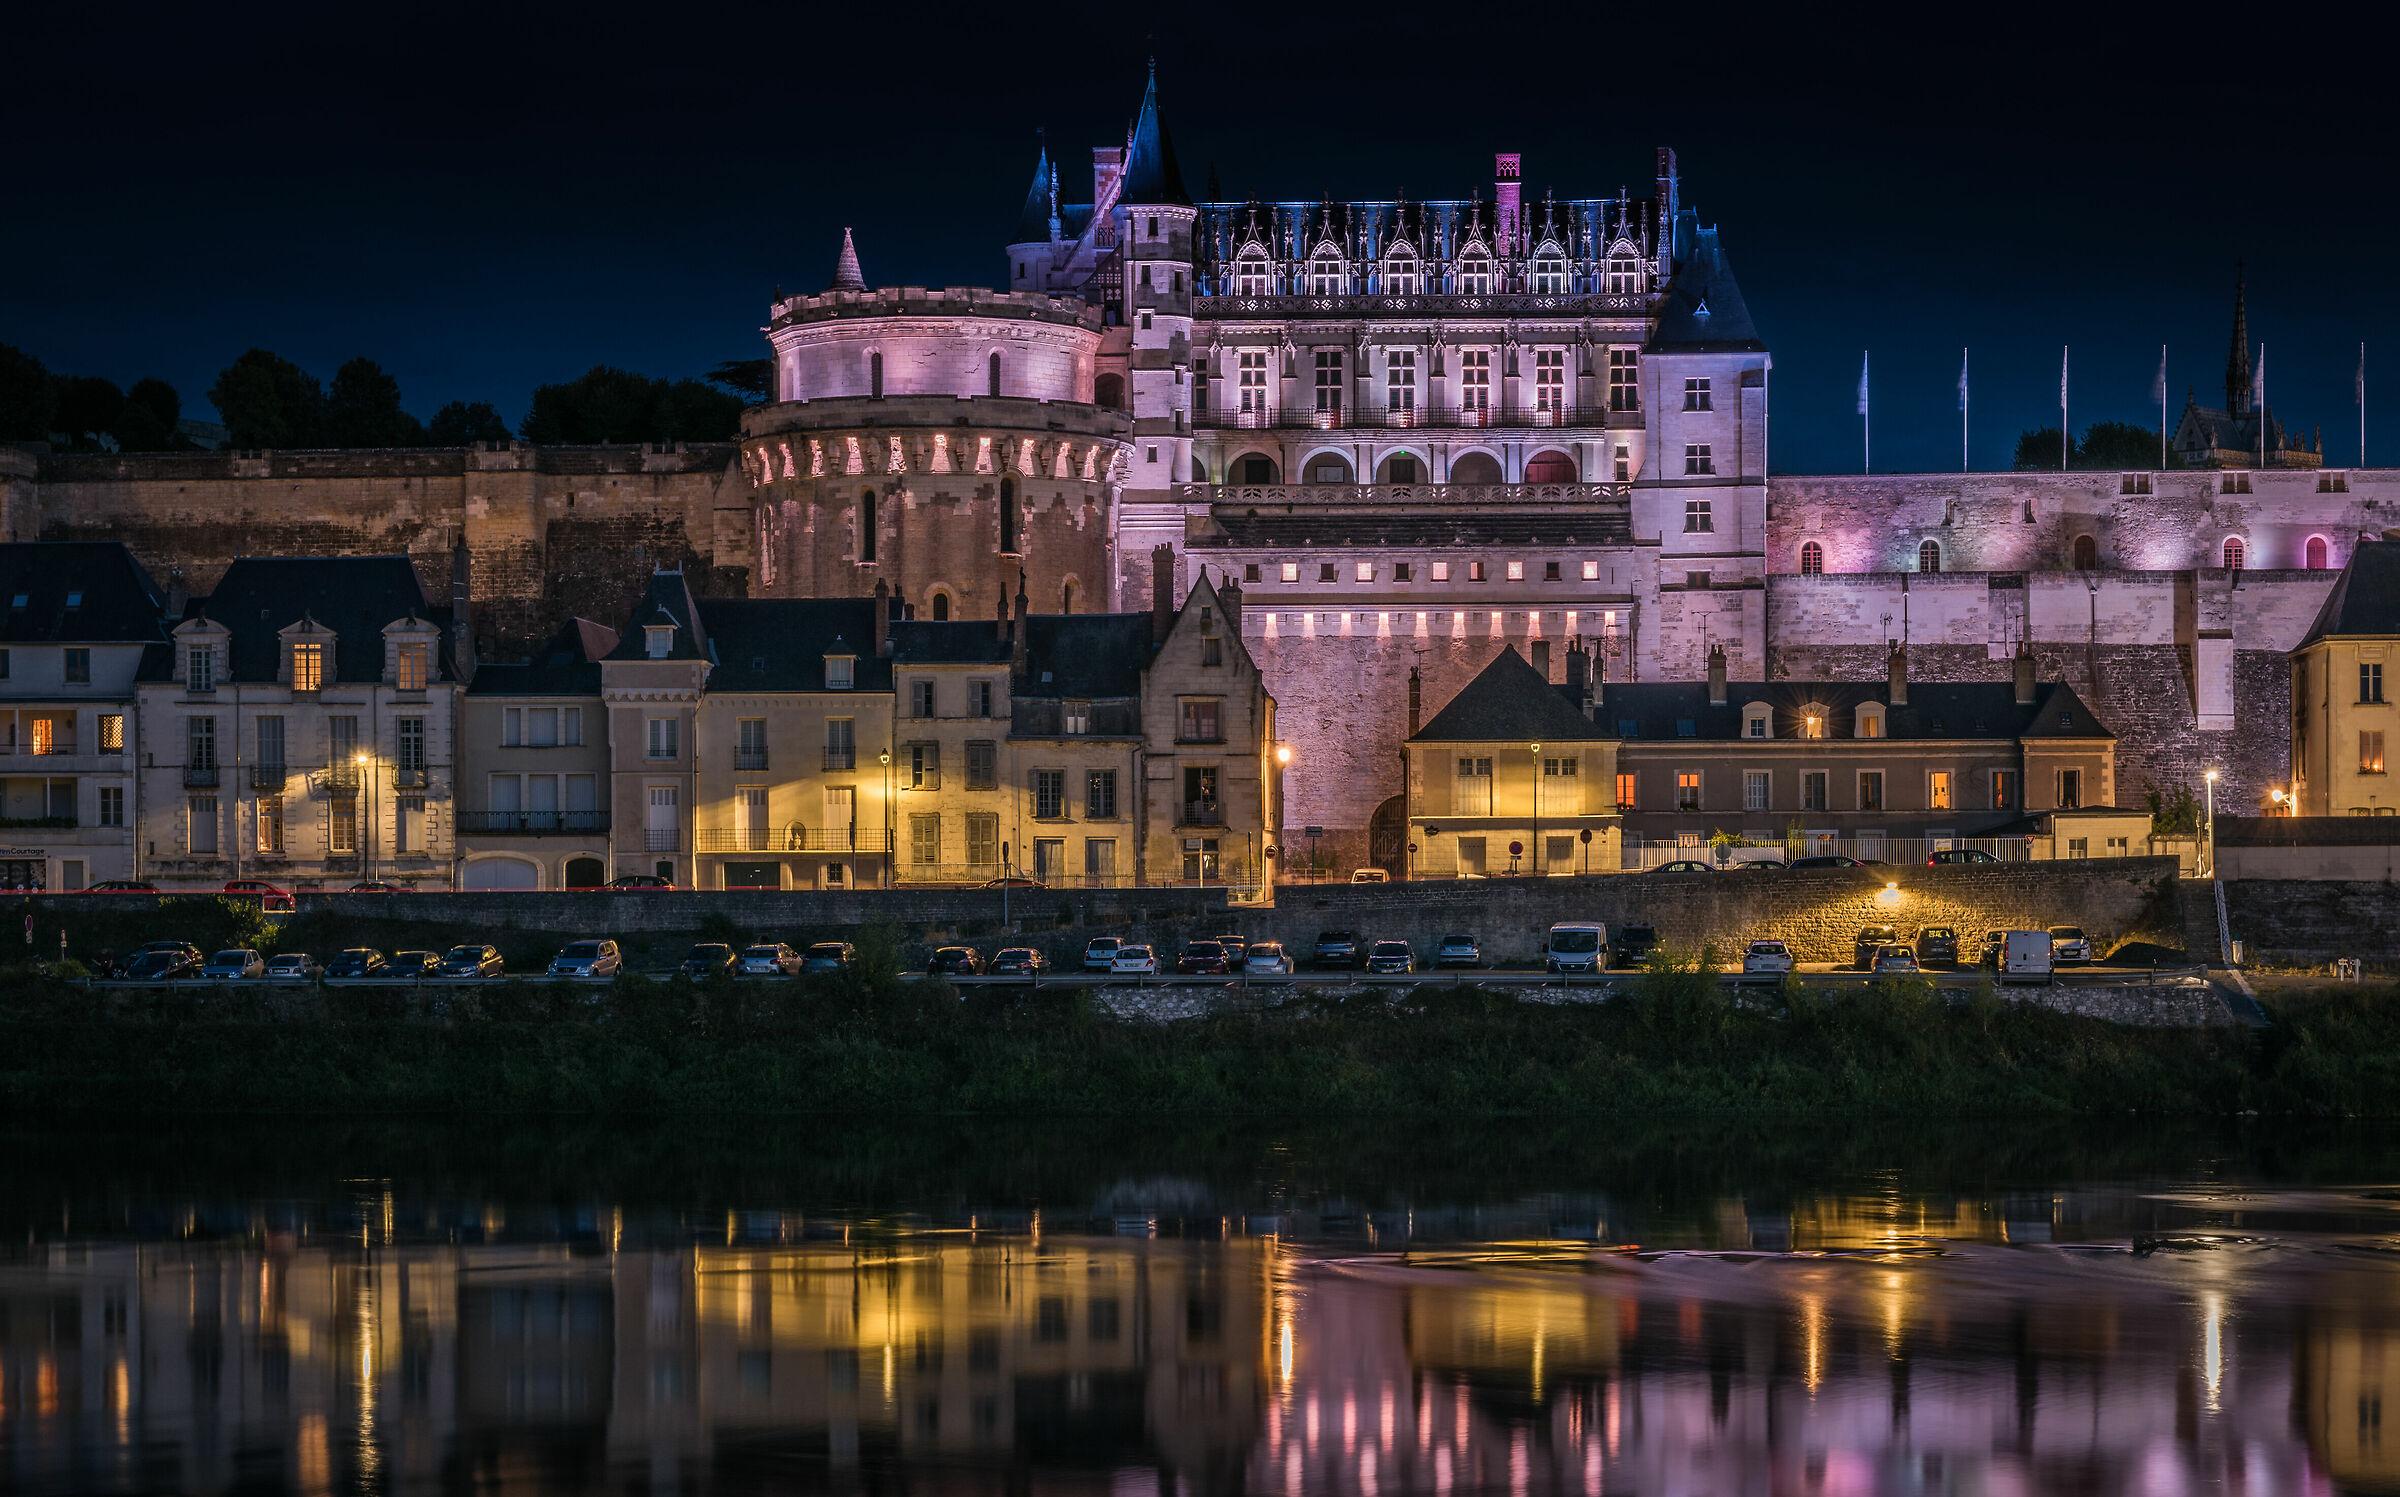 Amboise Castle 2 France Summer 2019...